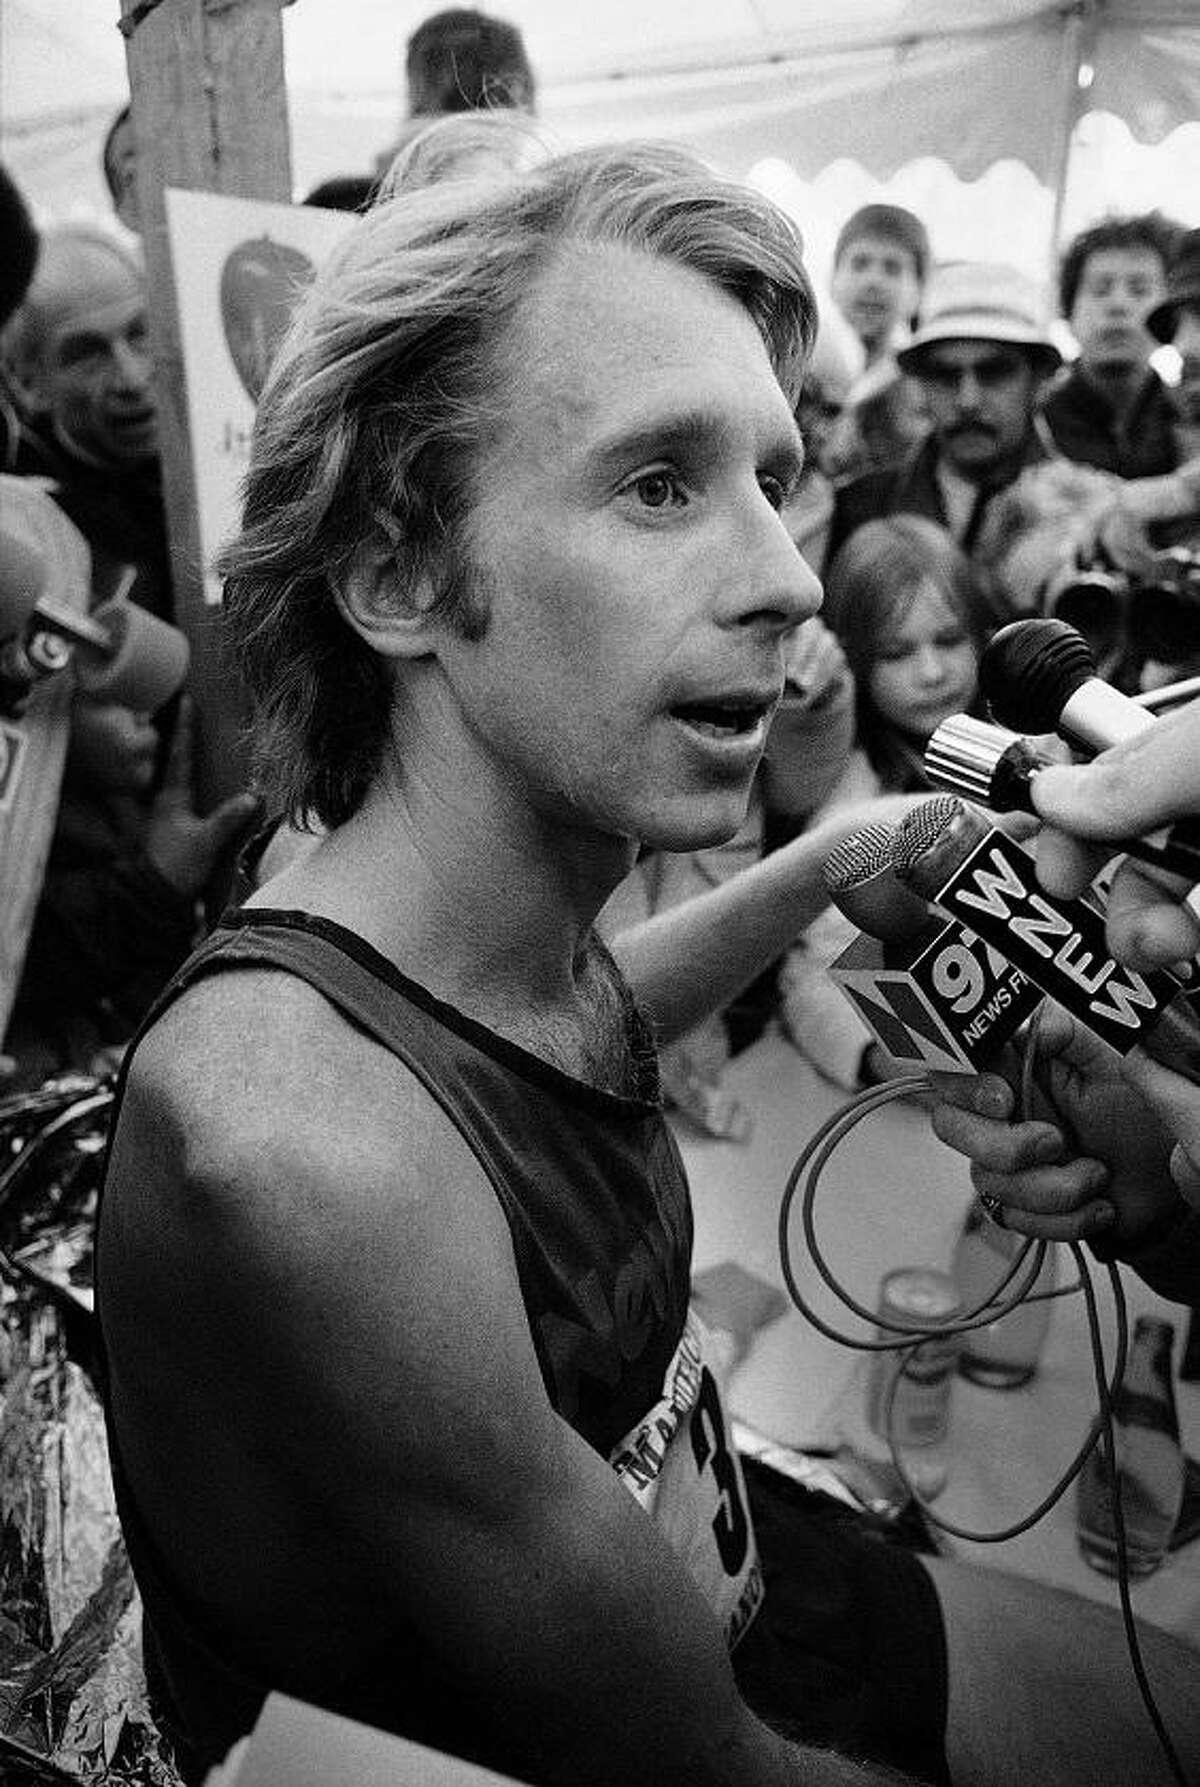 Bill Rodgers is the winner of the New York Marathon, Oct. 23, 1977. Rodgers, from Boston, Mass., won the marathon last year. (AP Photo/Carlos Rene Perez)